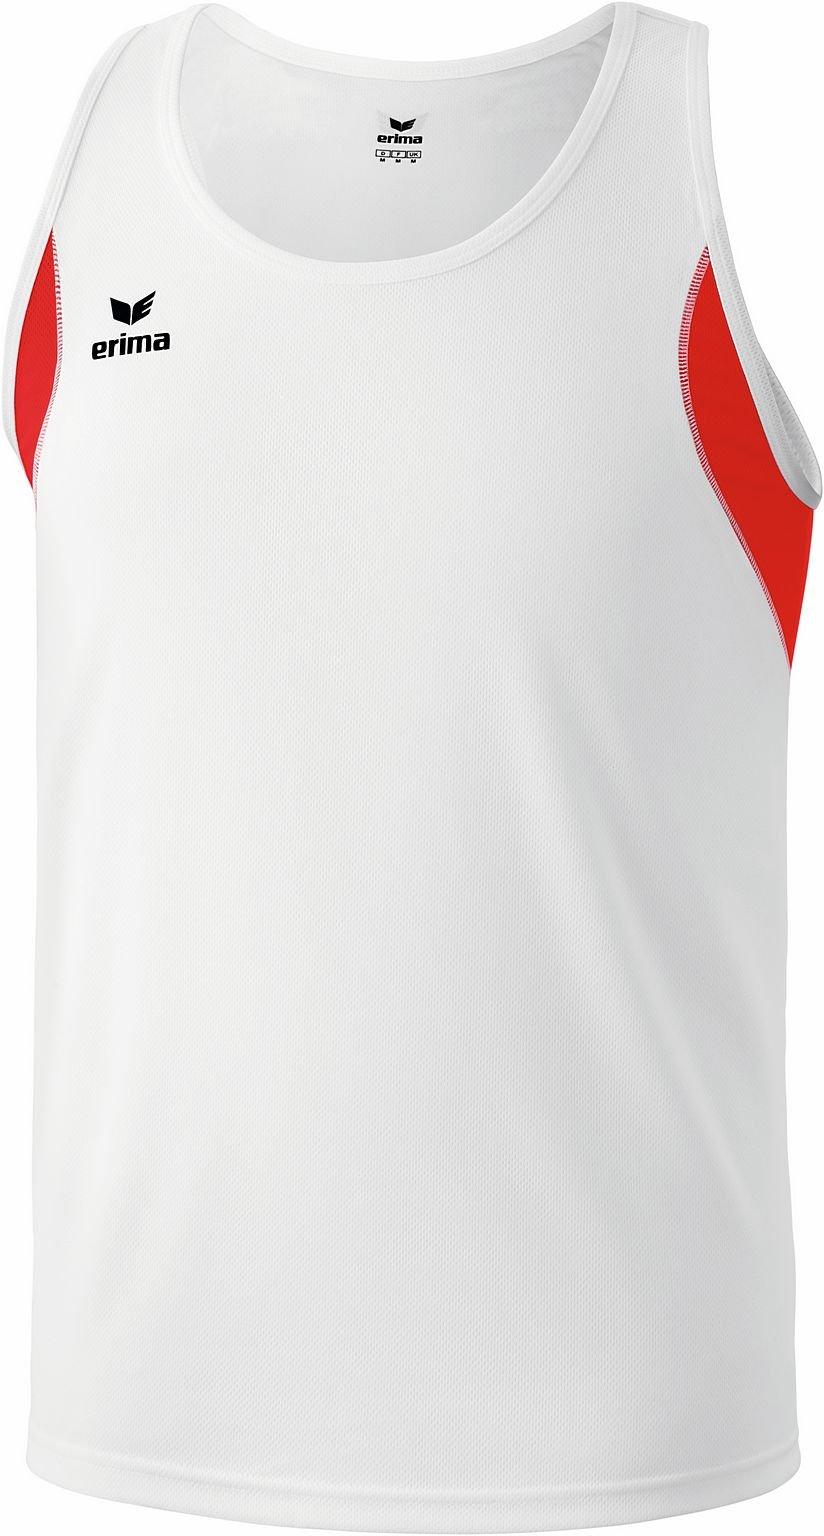 Erima - Canottiera junior da running, Bianco (bianco/rosso), 164